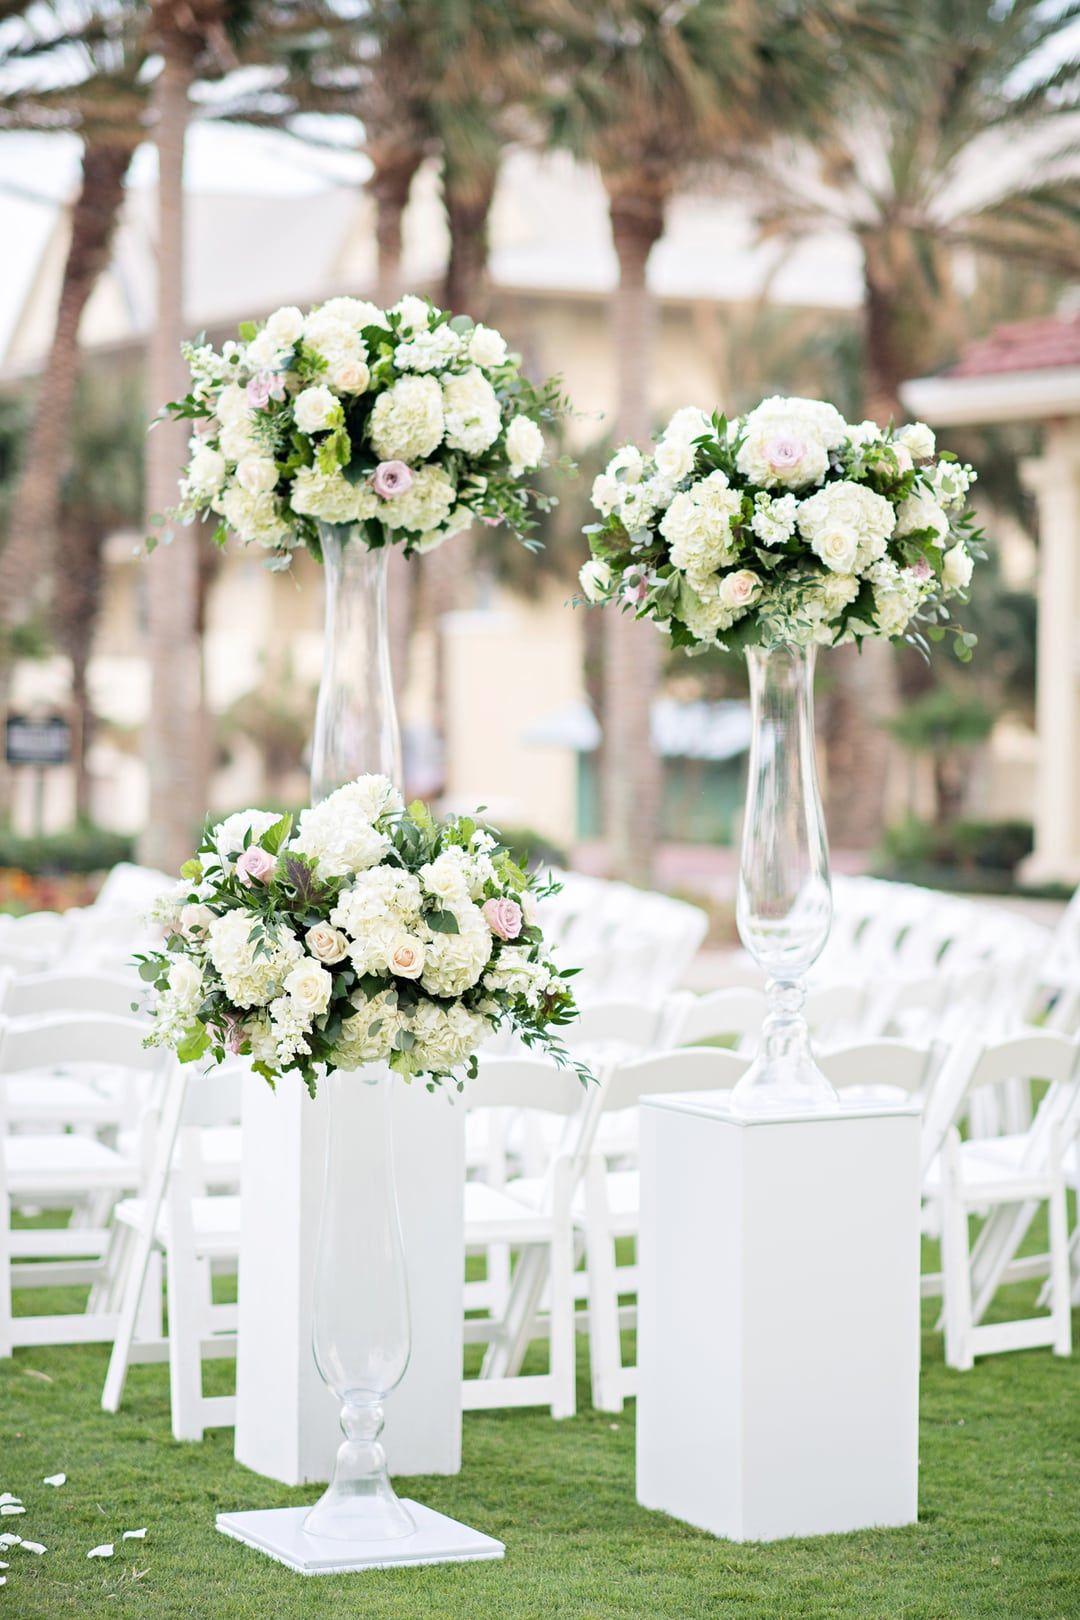 Elegant White Fl Arrangements For An Oceanside Wedding Ceremony At Hammock Beach Resort In Palm Coast